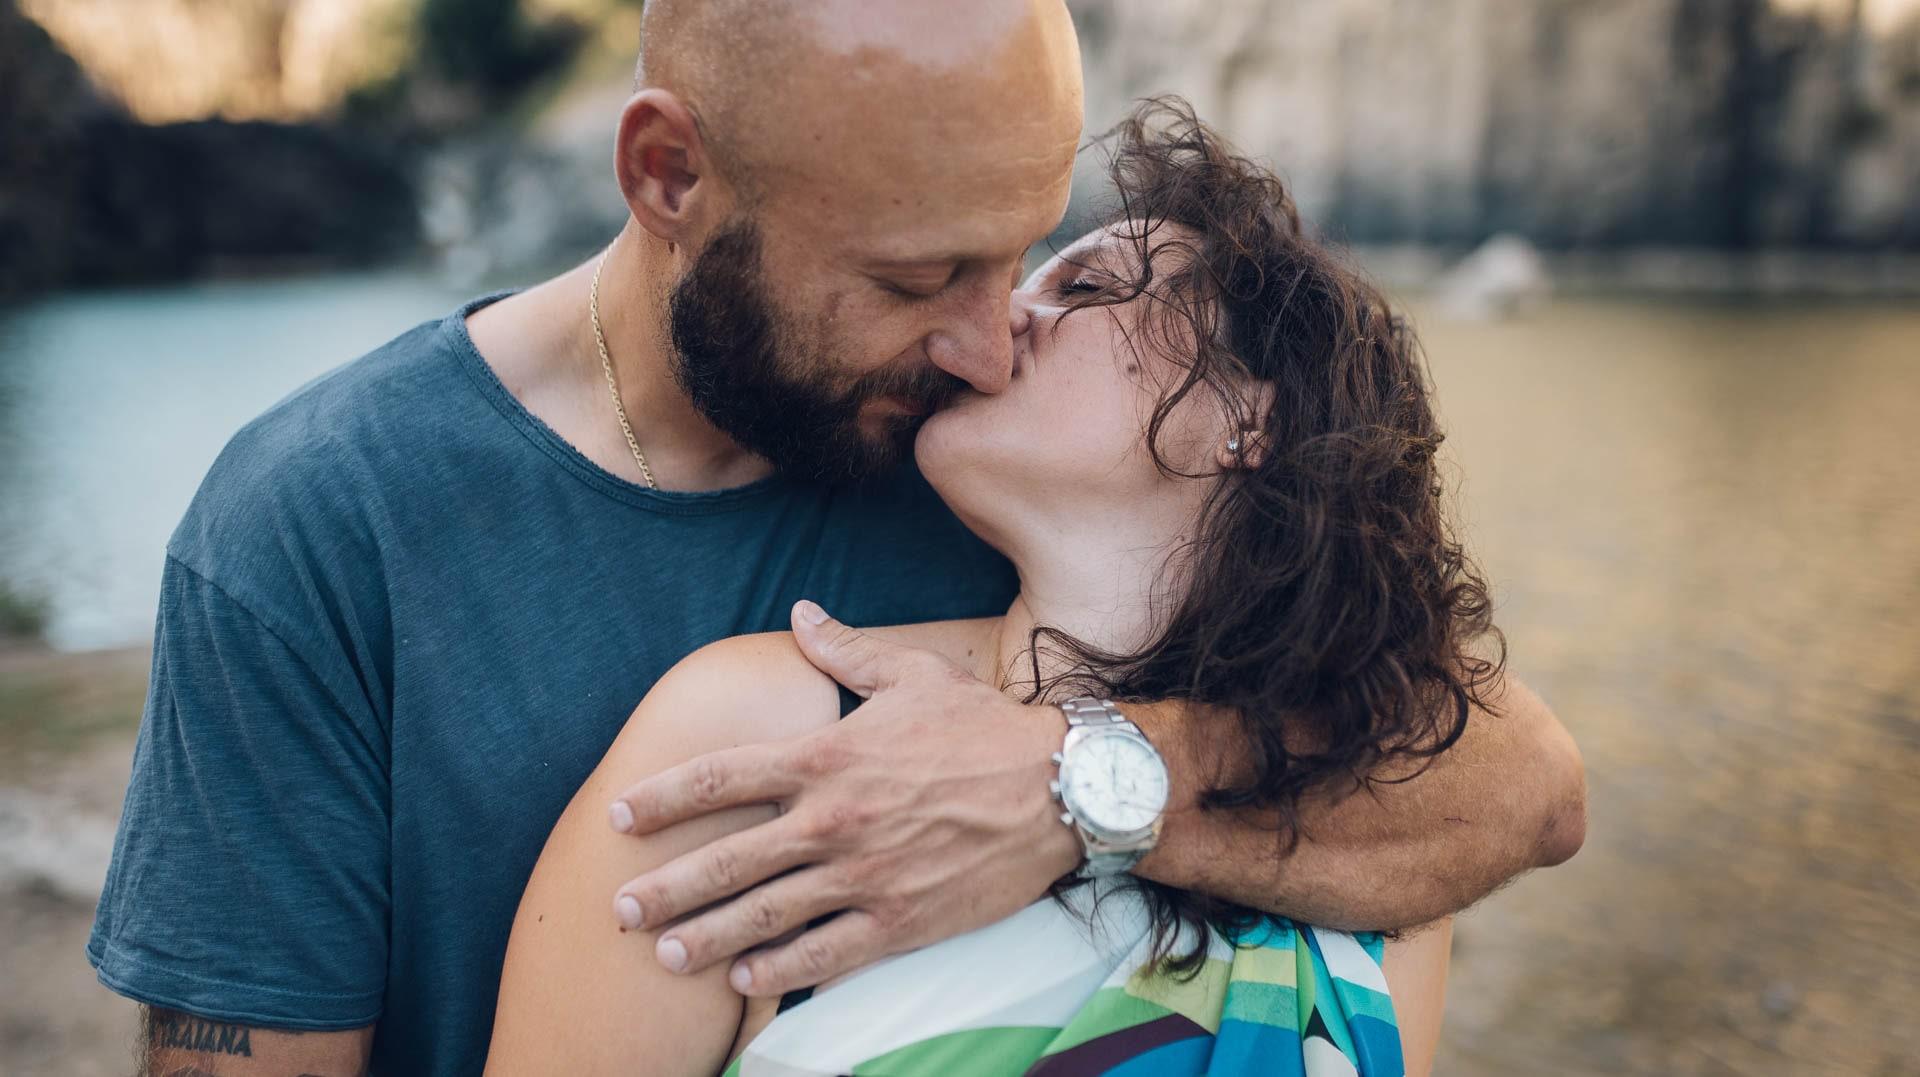 Sessione Fotografica di coppia Vulci - Noemi Federici